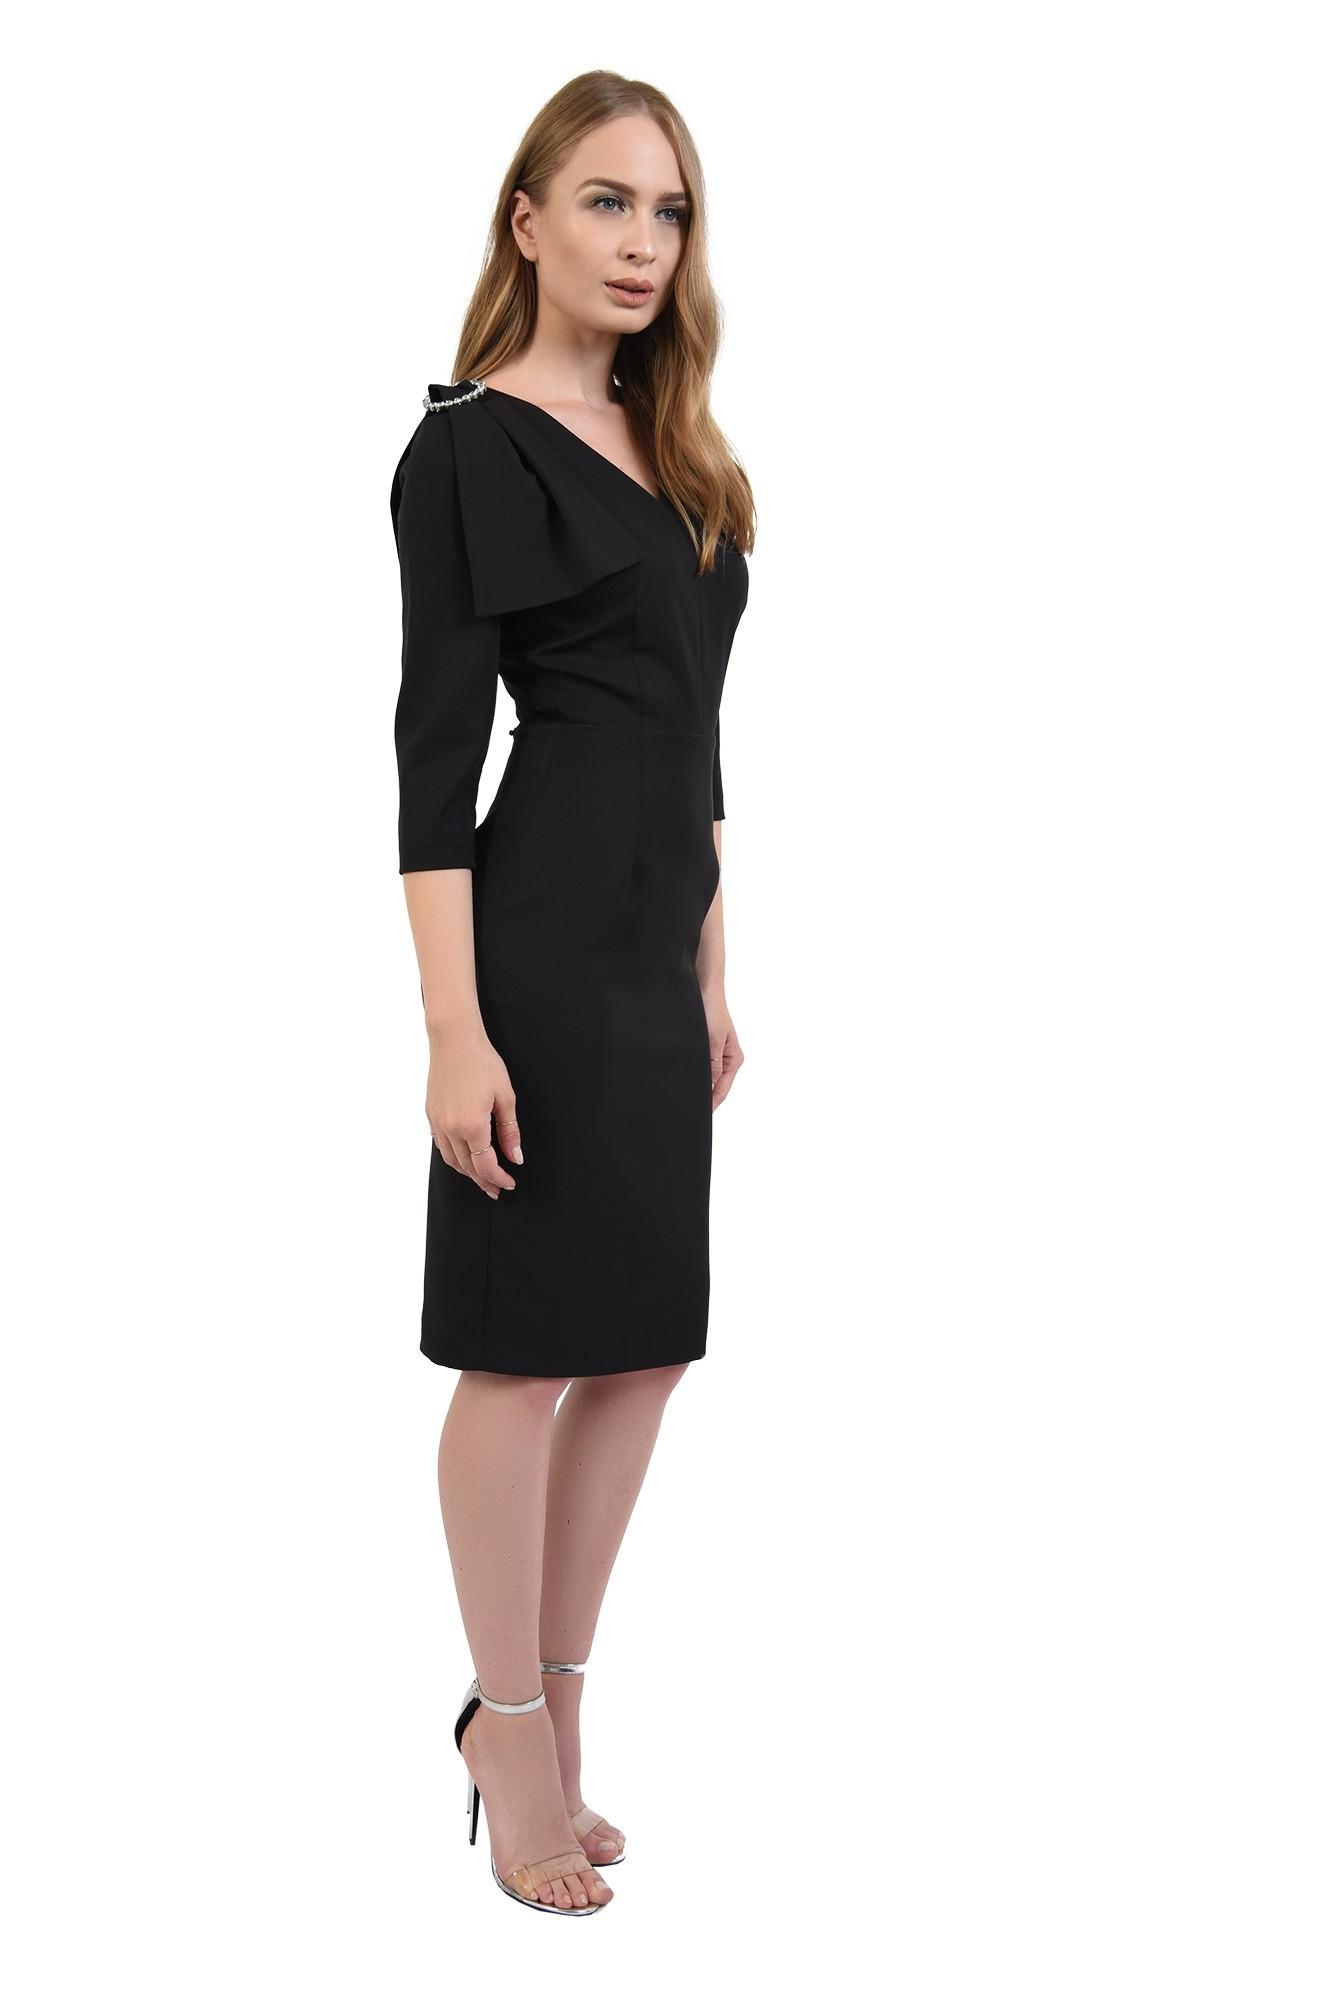 3 - 360 - rochie poema, negra, eleganta, cu funda